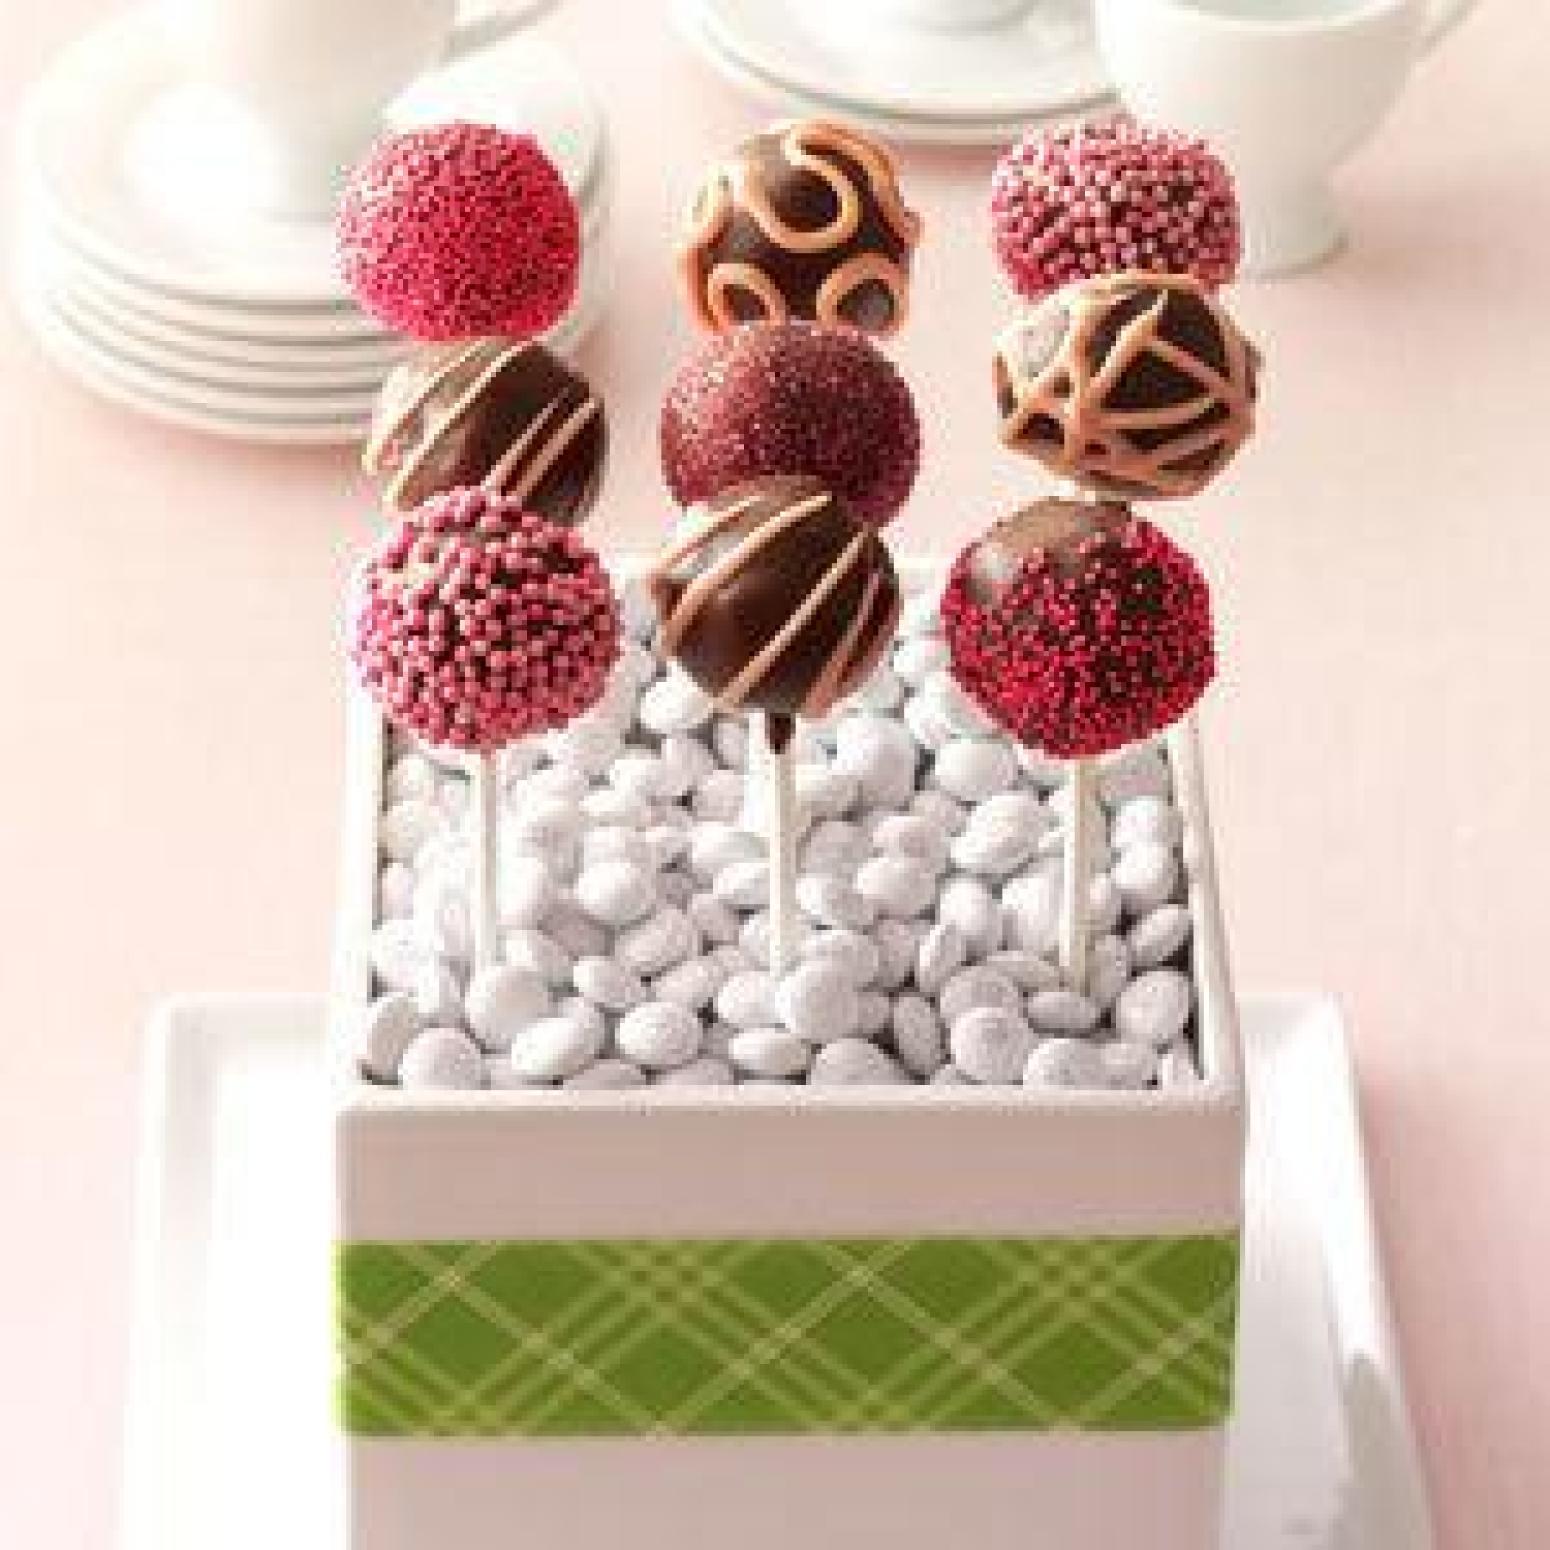 Cake Pop Pictures Recipes : Raspberry Truffle Cake Pops Recipe Just A Pinch Recipes